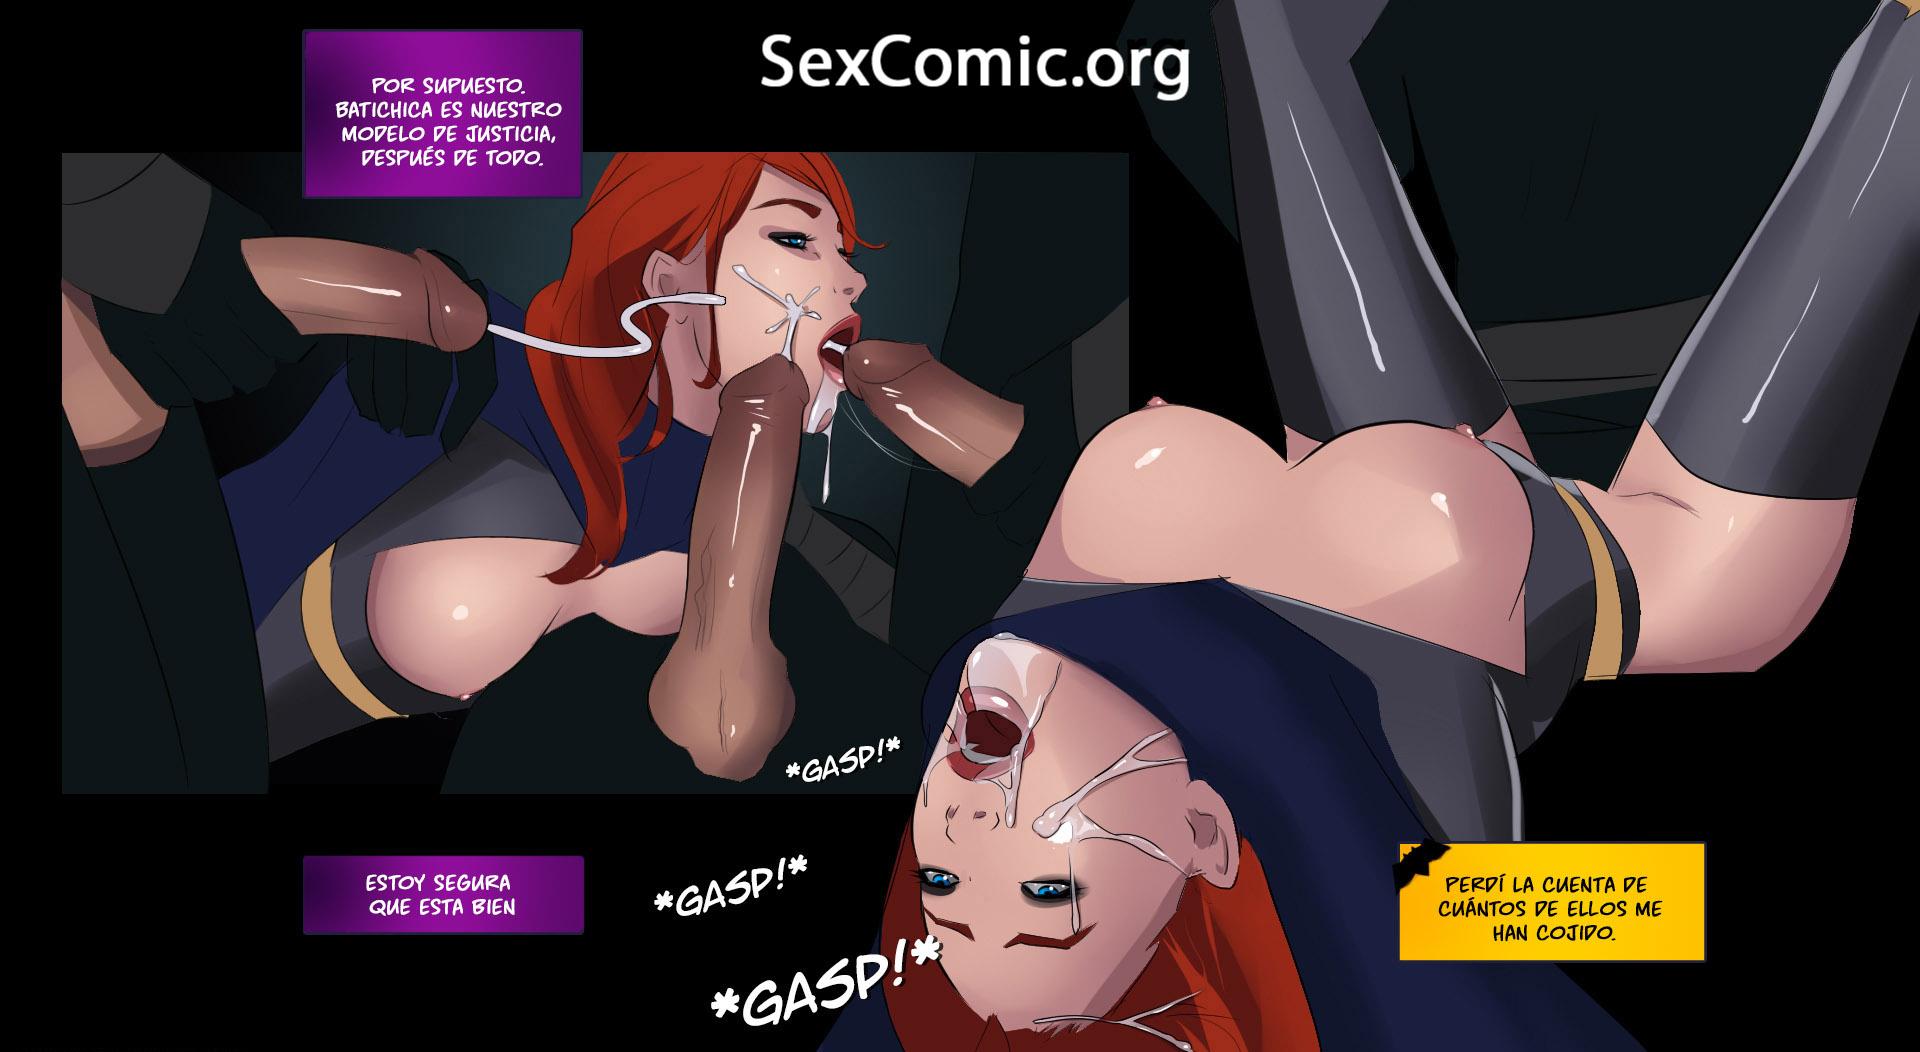 comic-xxx-super-heroes-marvel-historias-eroticas-mangas-sexuales-hentai-videos-pono-comics-de-incesto-gratis-3